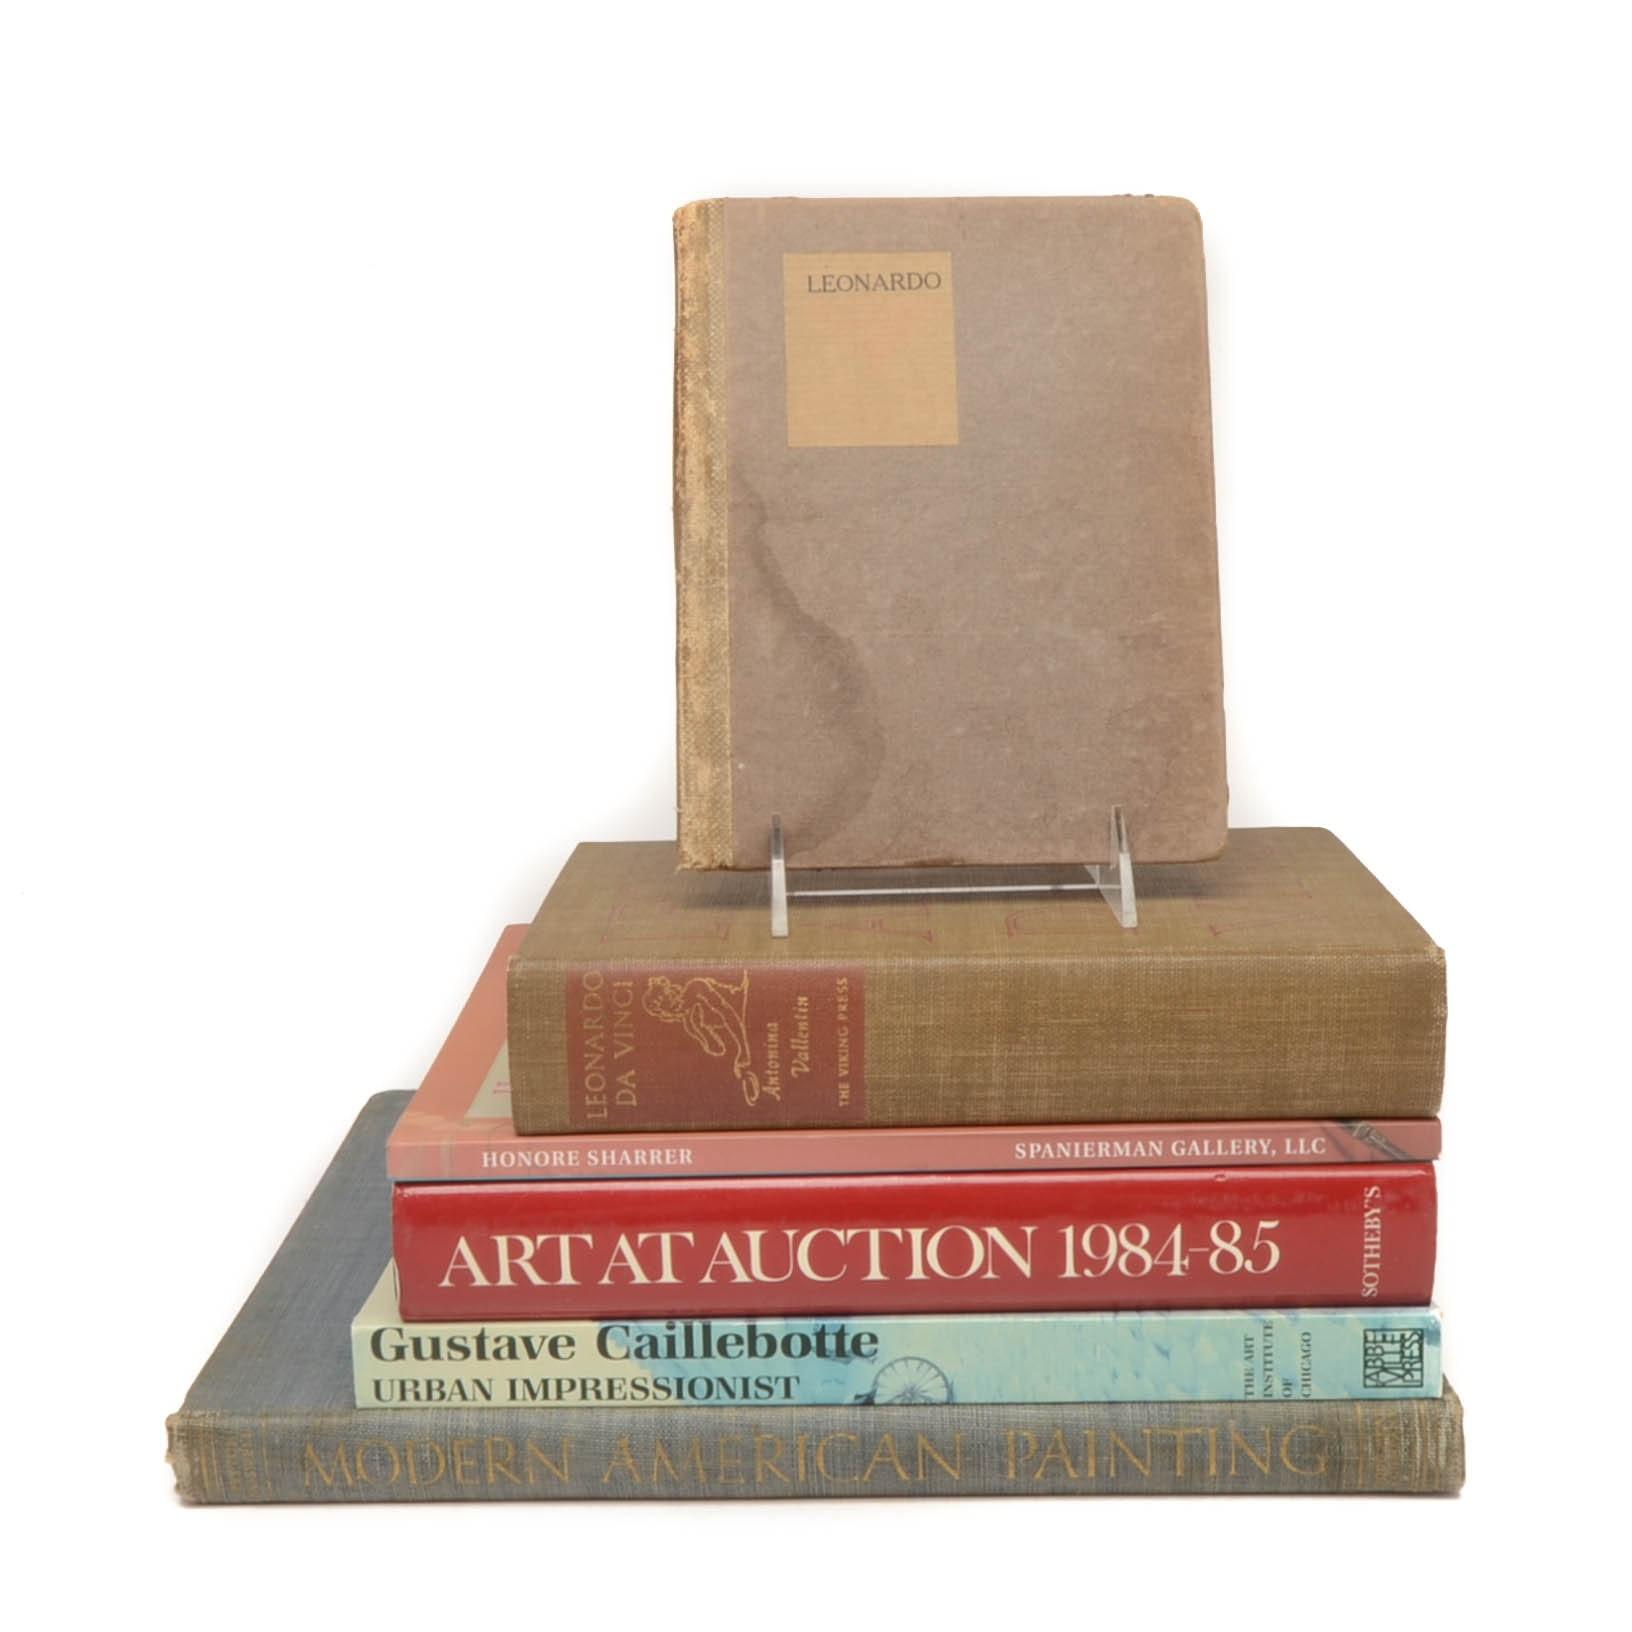 Group of Vintage Illustrated Art Books